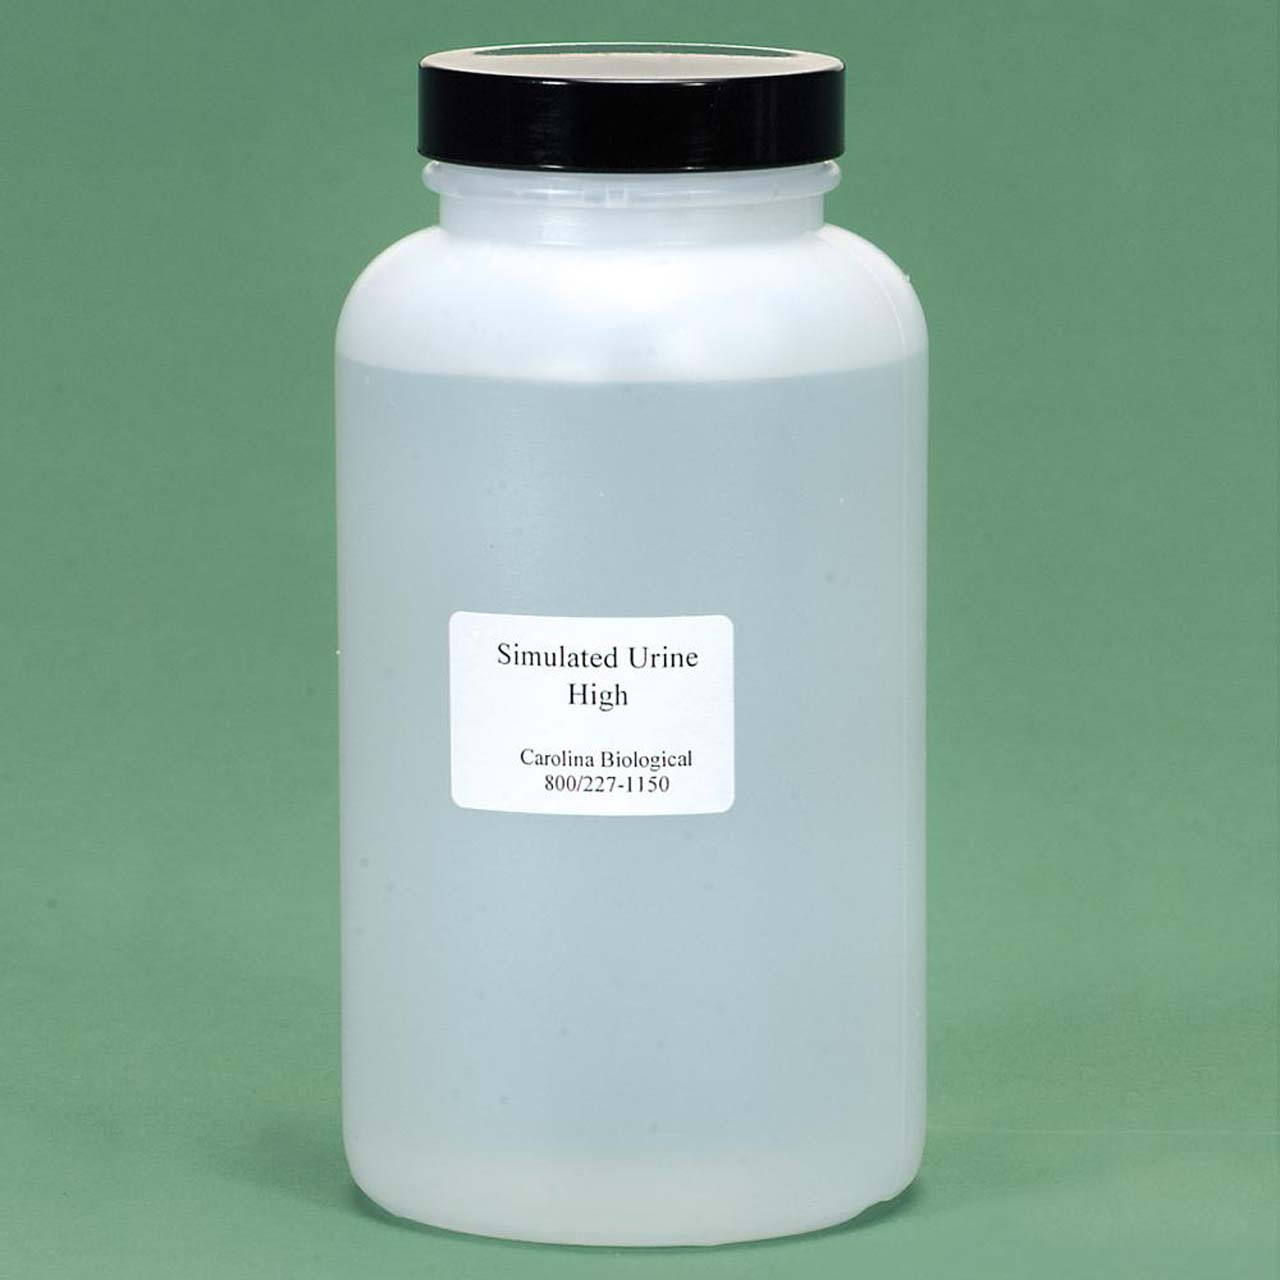 Simulated urine, High